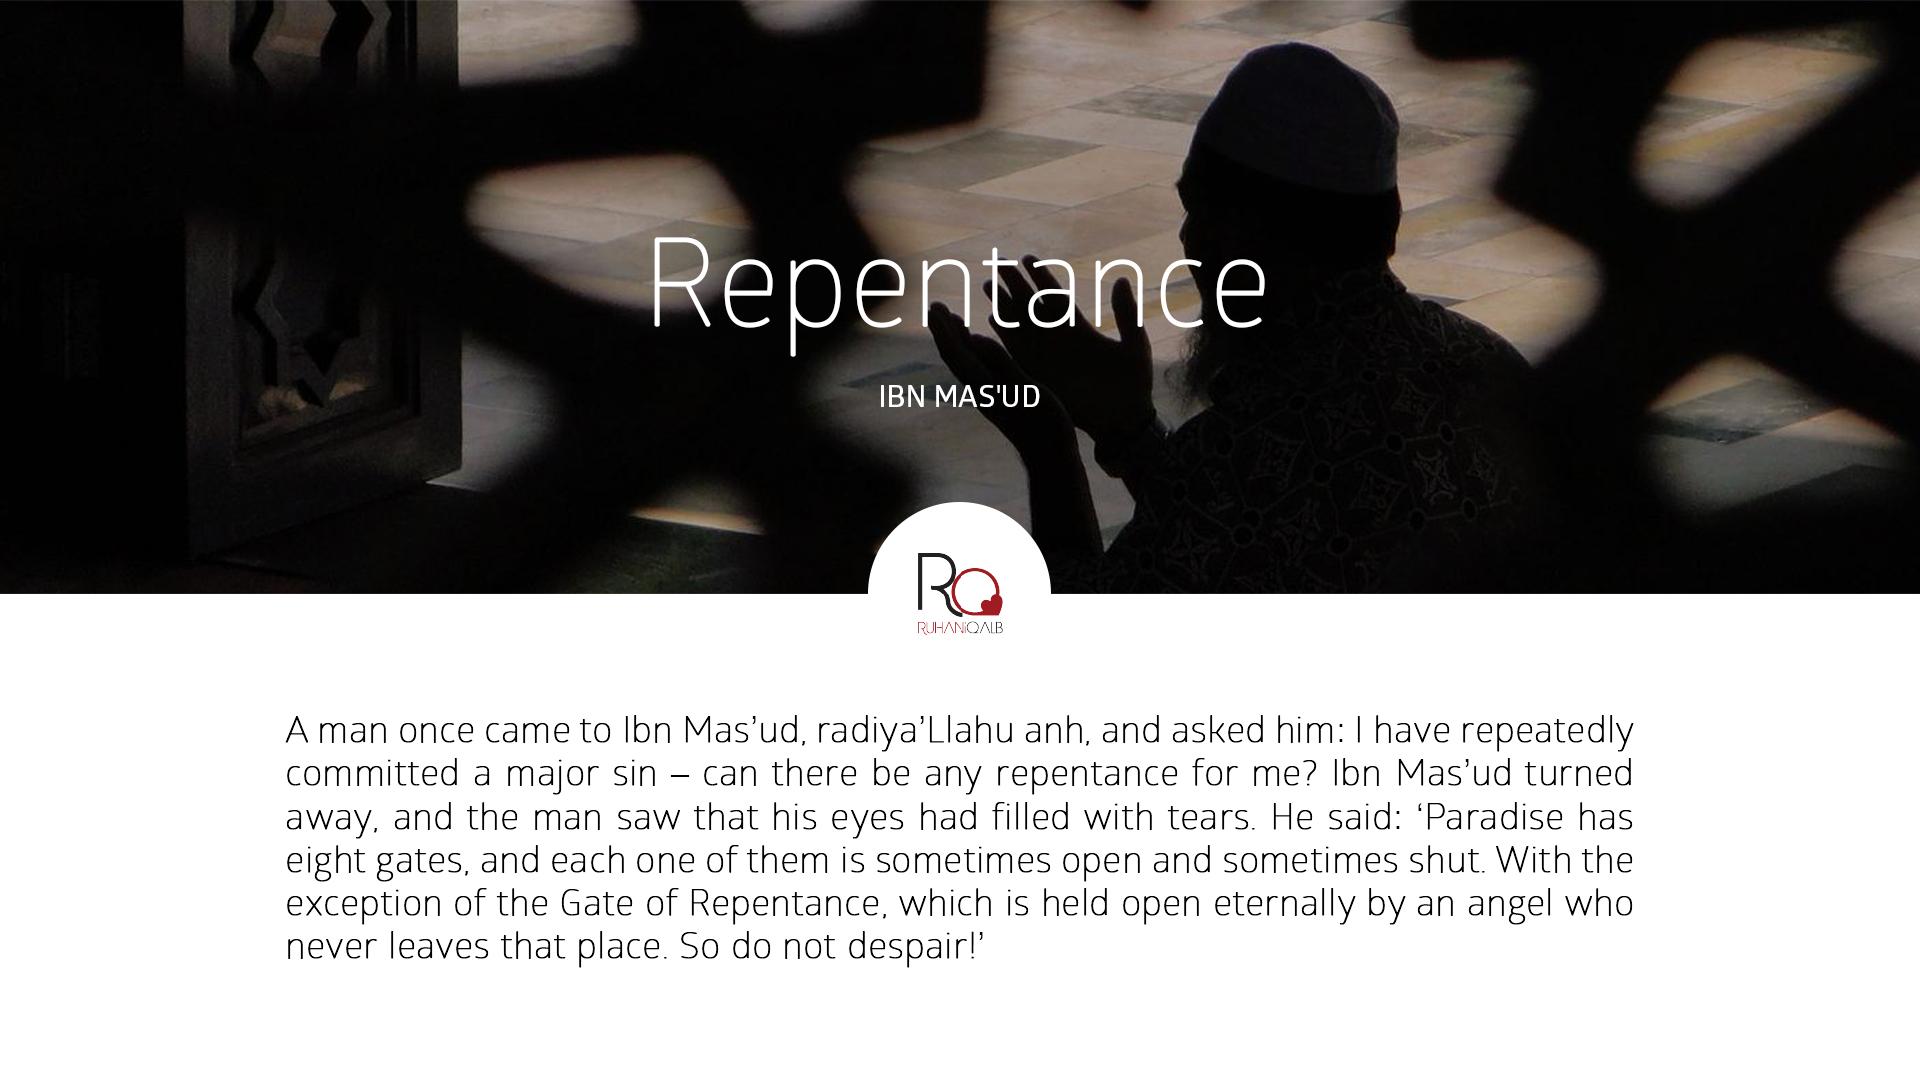 Ibn-Masud-on-Repentance